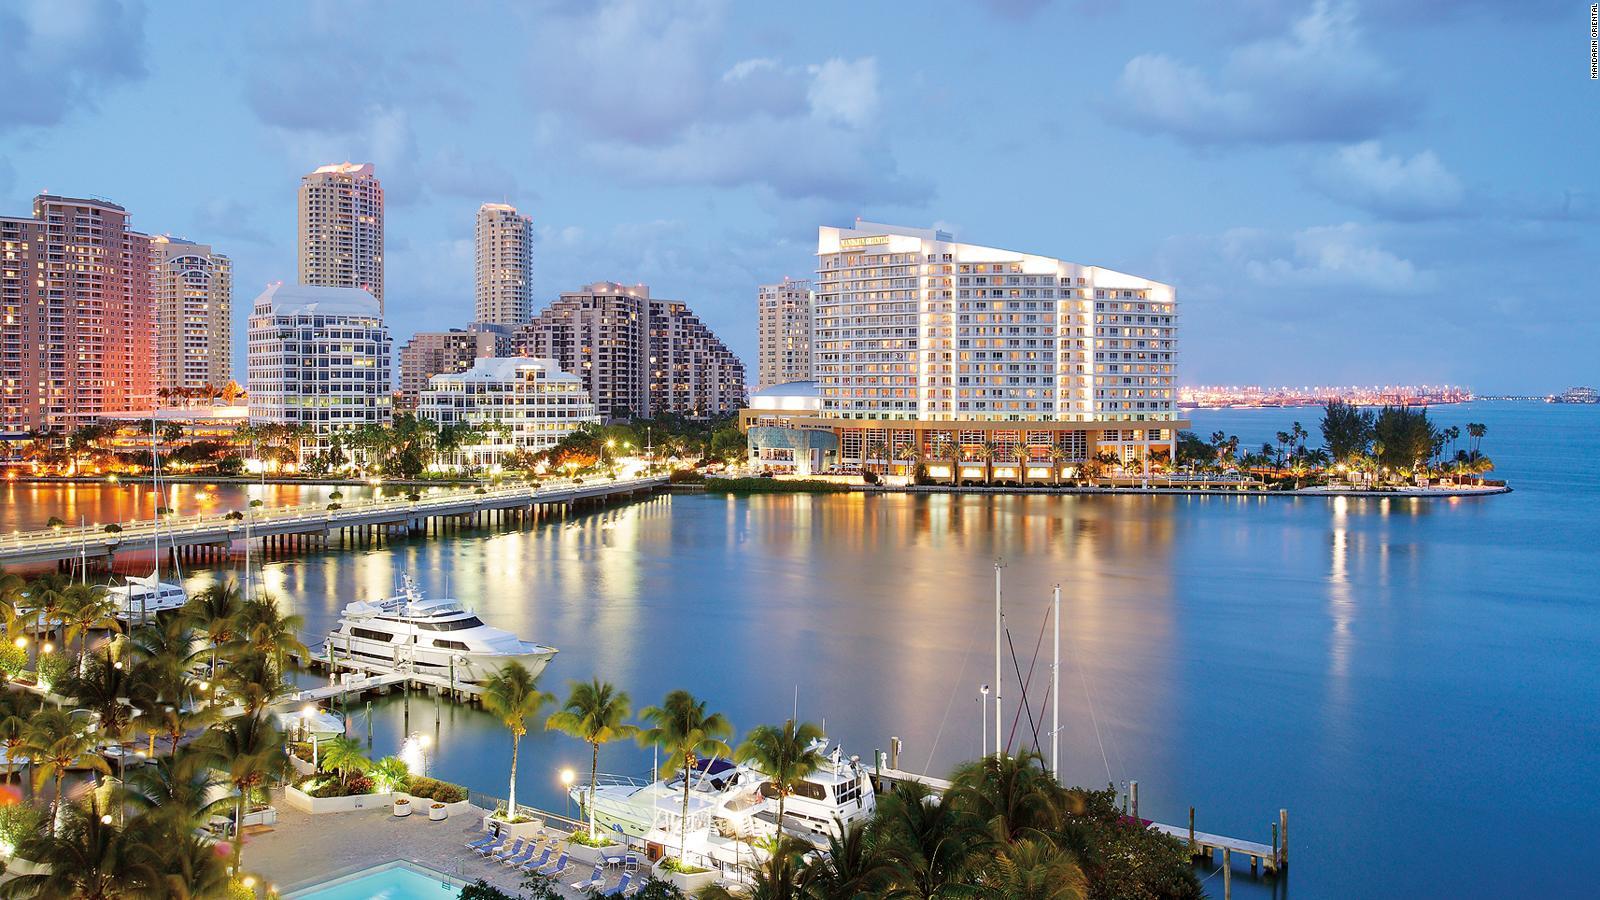 LTI reveals the world's 10 best luxury hotel brands   CNN Travel